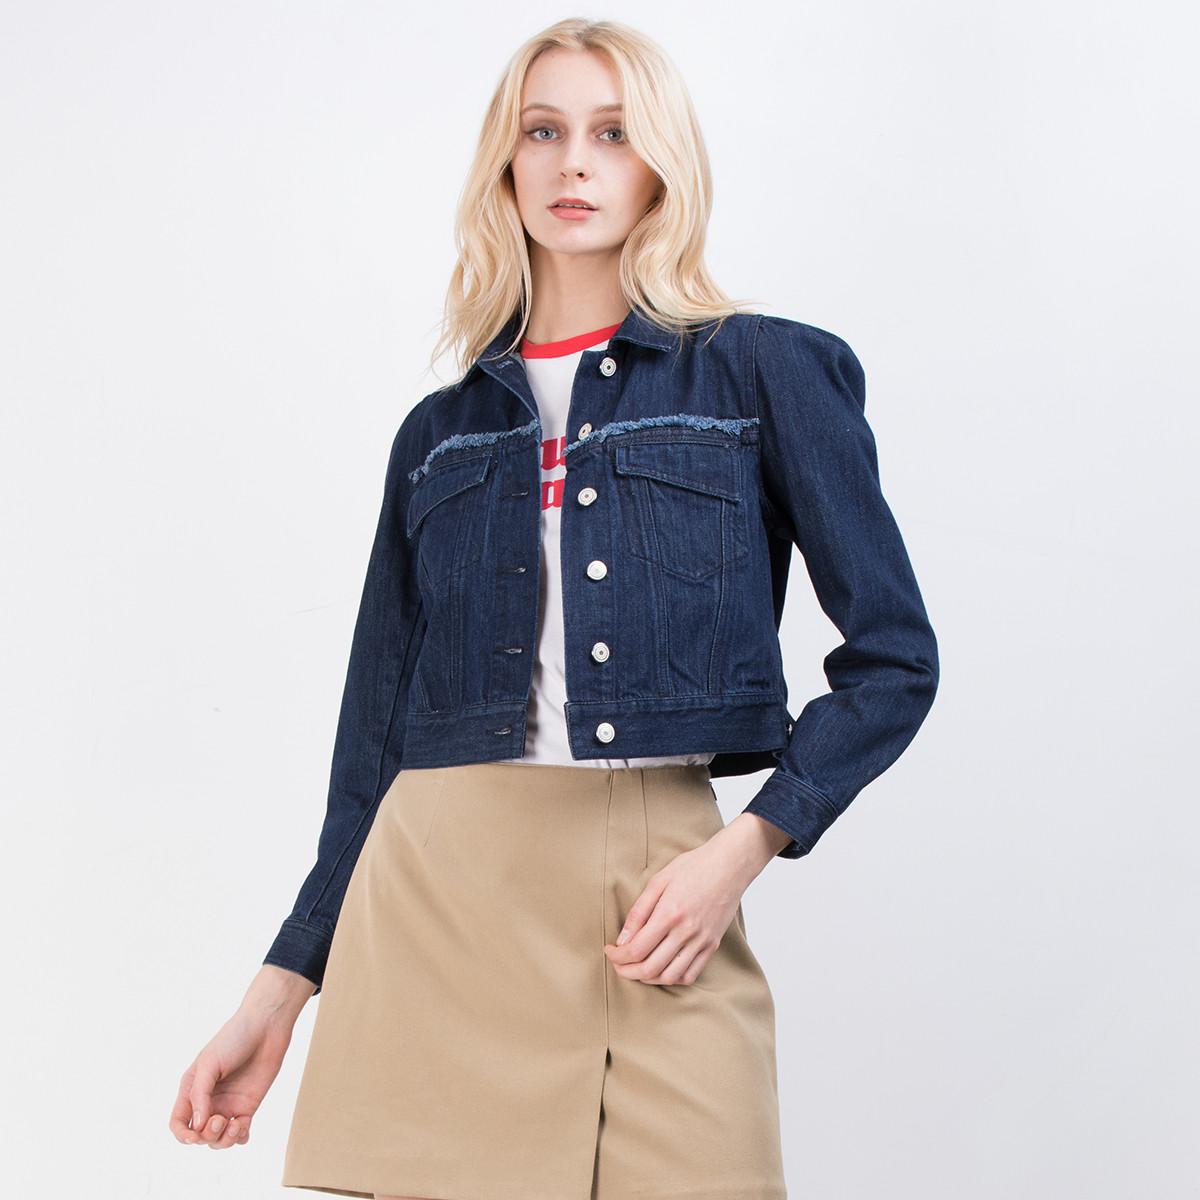 SLYSLY韩版时尚长袖牛仔外套038BSK10-0070-110